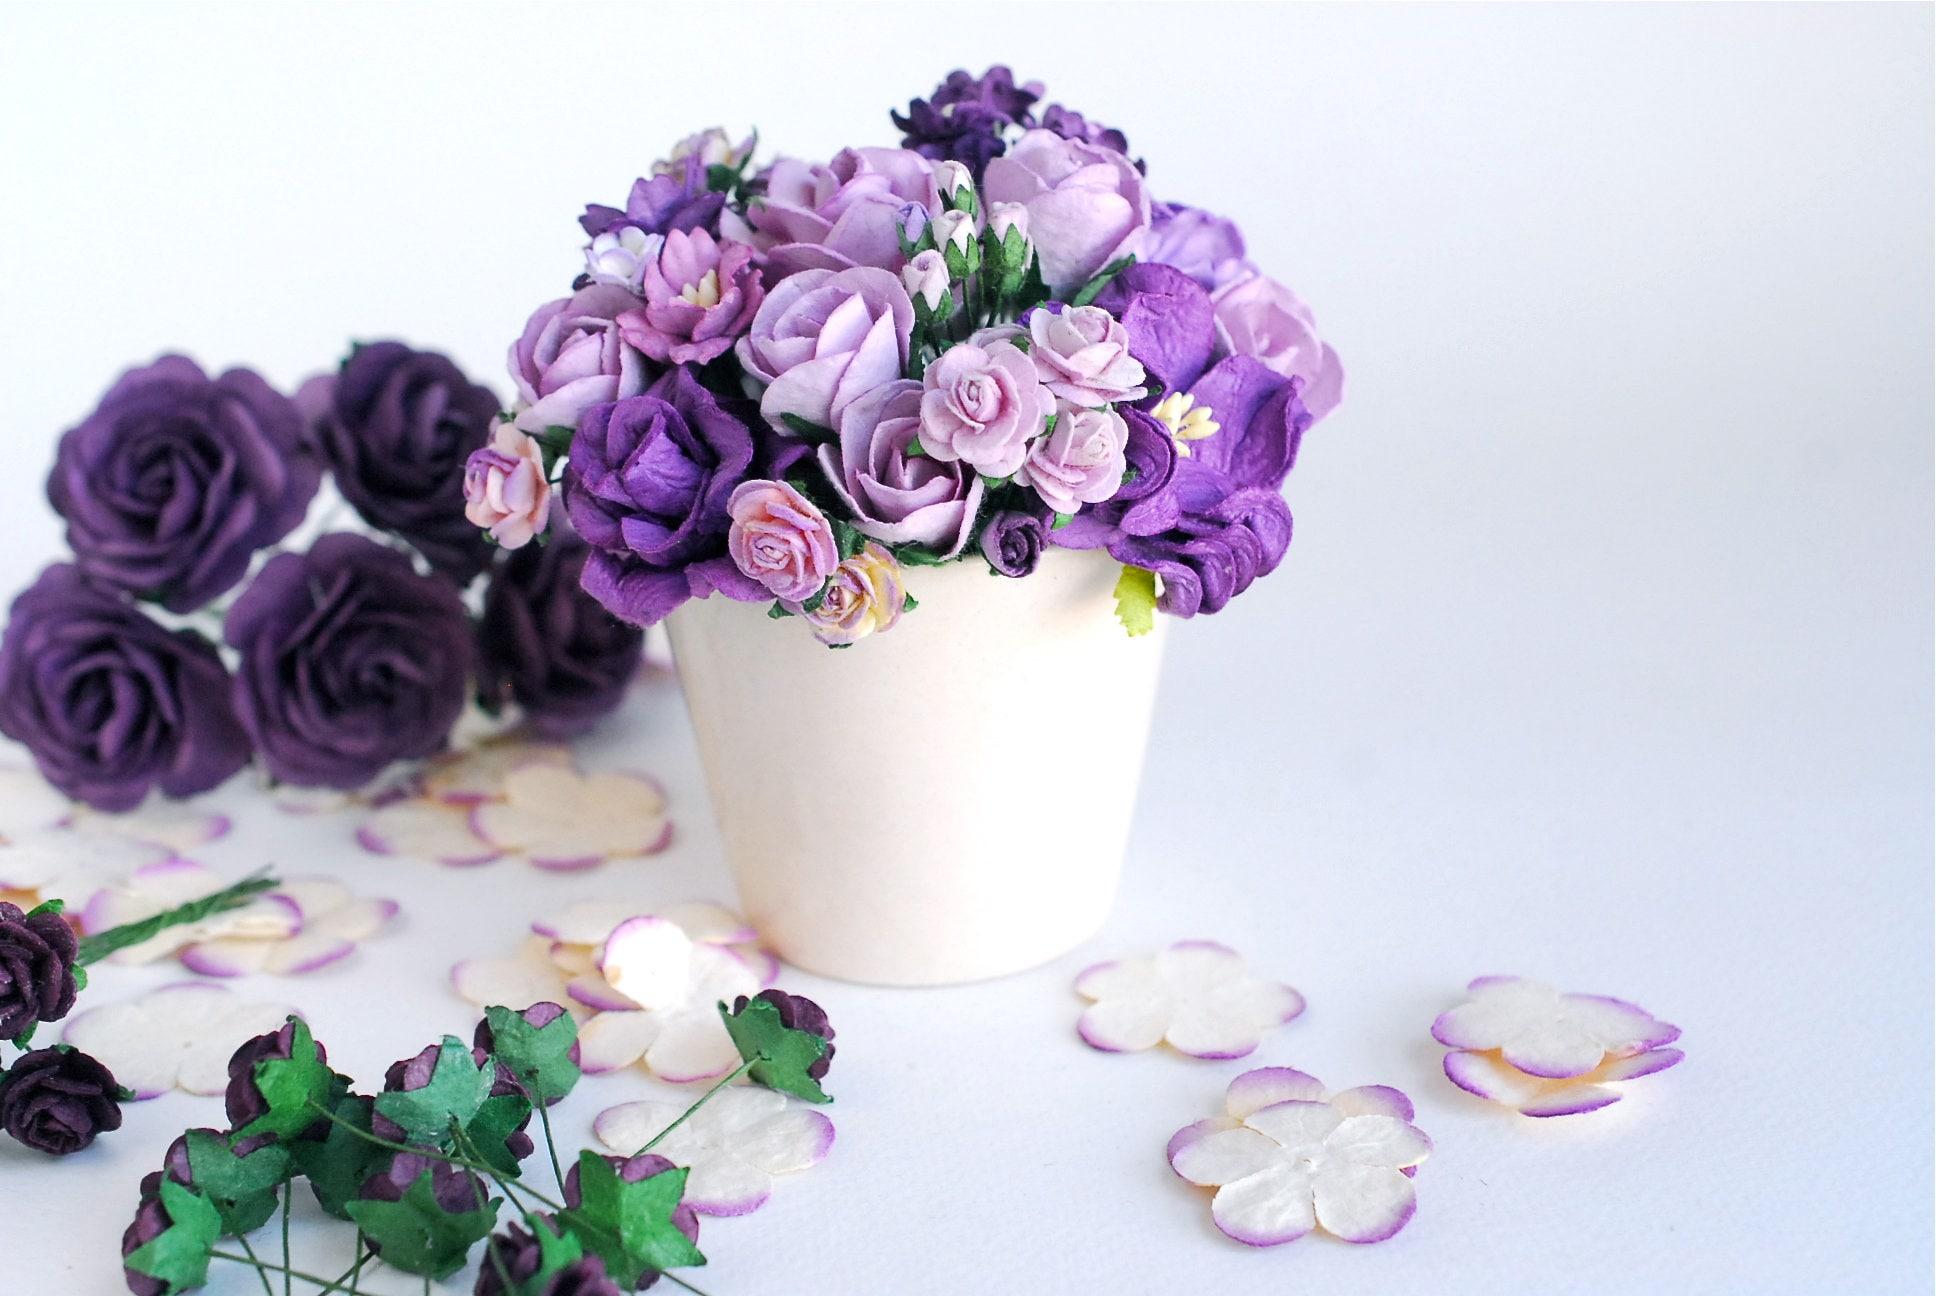 Paper Flower Pot Decoration Centerpiece Purple Roses Budding Roses And Gardenia White Ceramic Pot Purple Tone Color